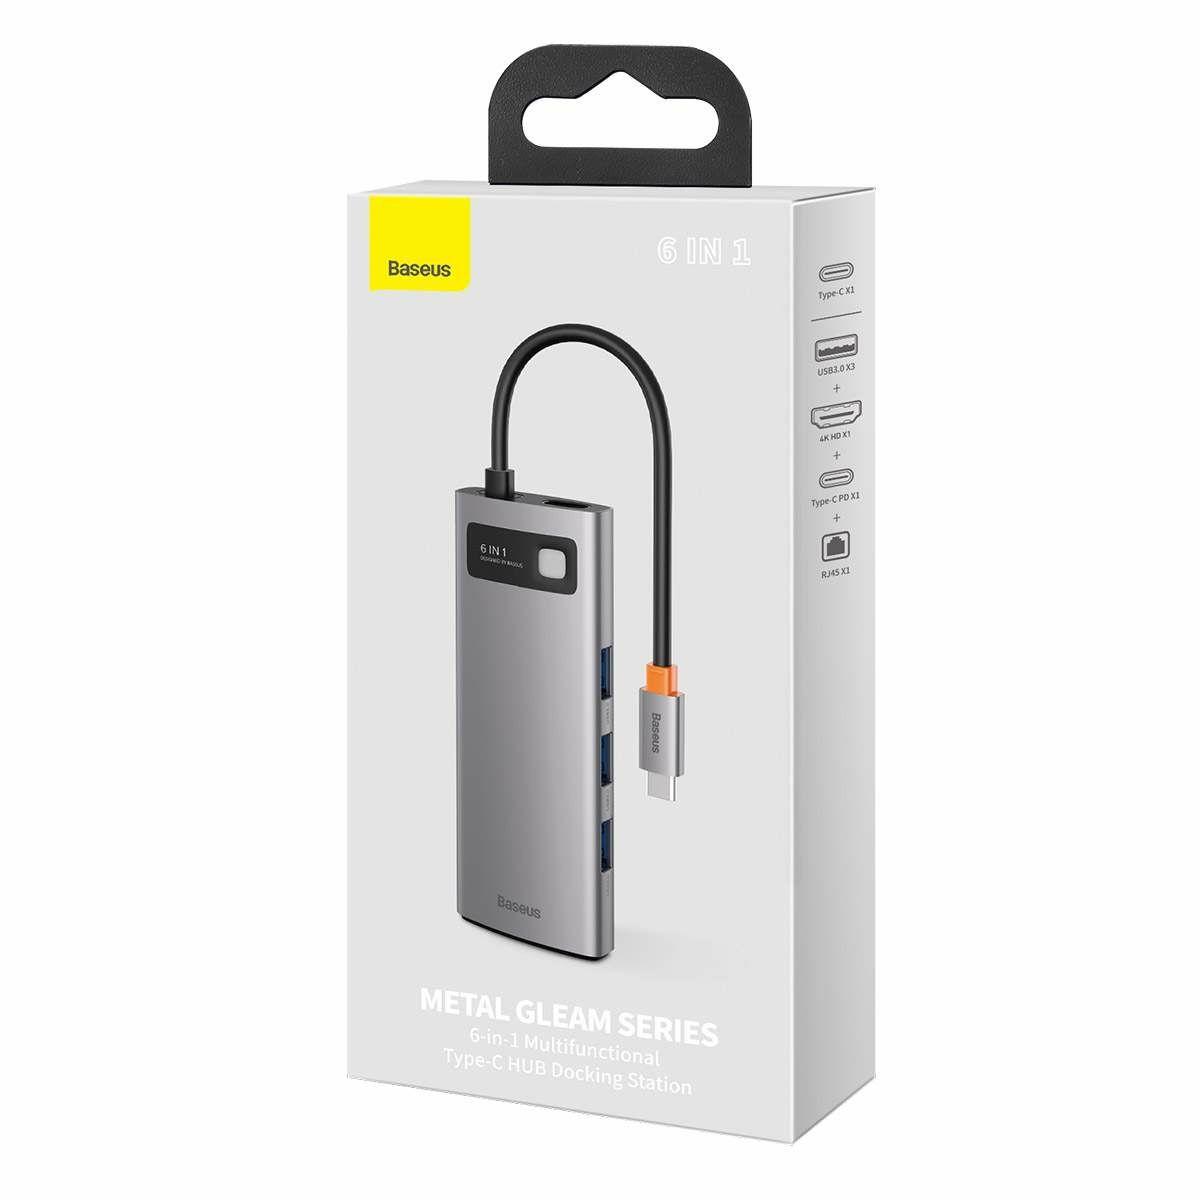 Baseus HUB Metal Gleam Series 6-in-1 Multifunkciós (Type-C bemenetről PD/4K HD/USB3.0) Dokkoló, szürke(CAHUB-CW0G)